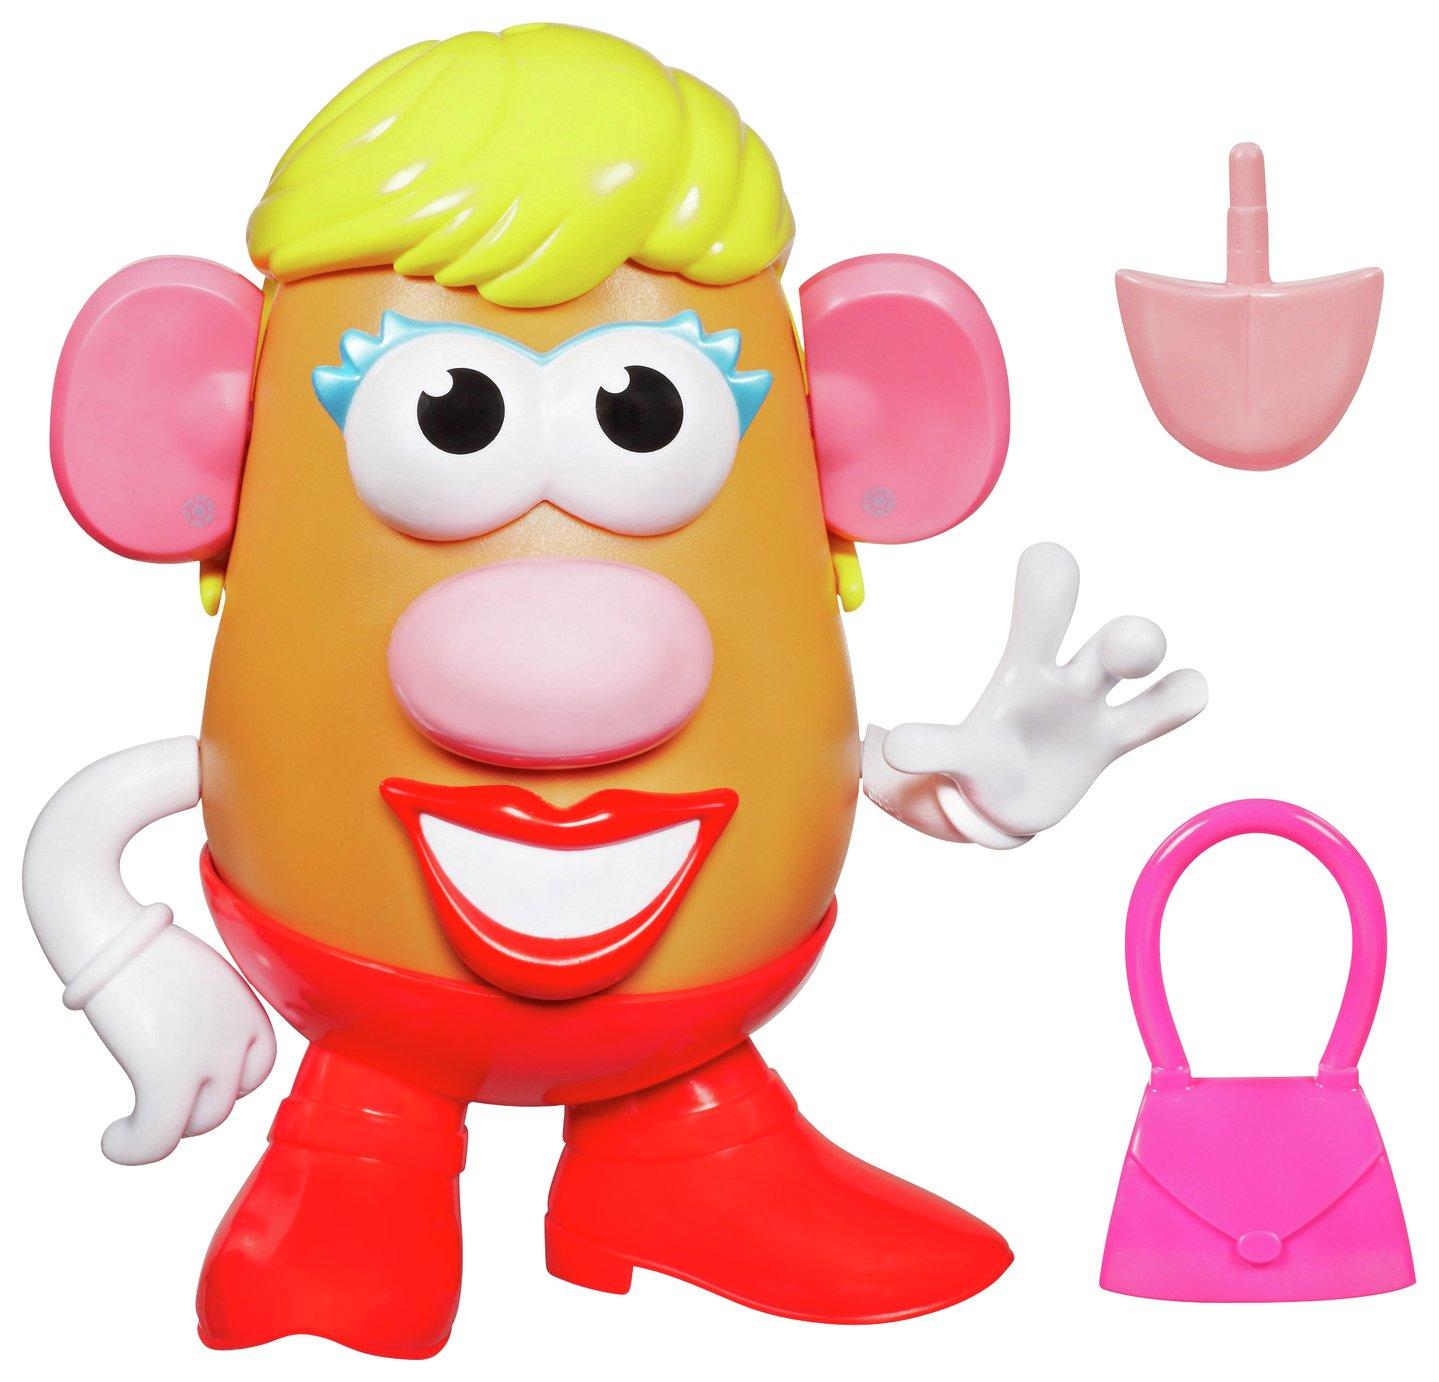 'Mrs. Potato Head